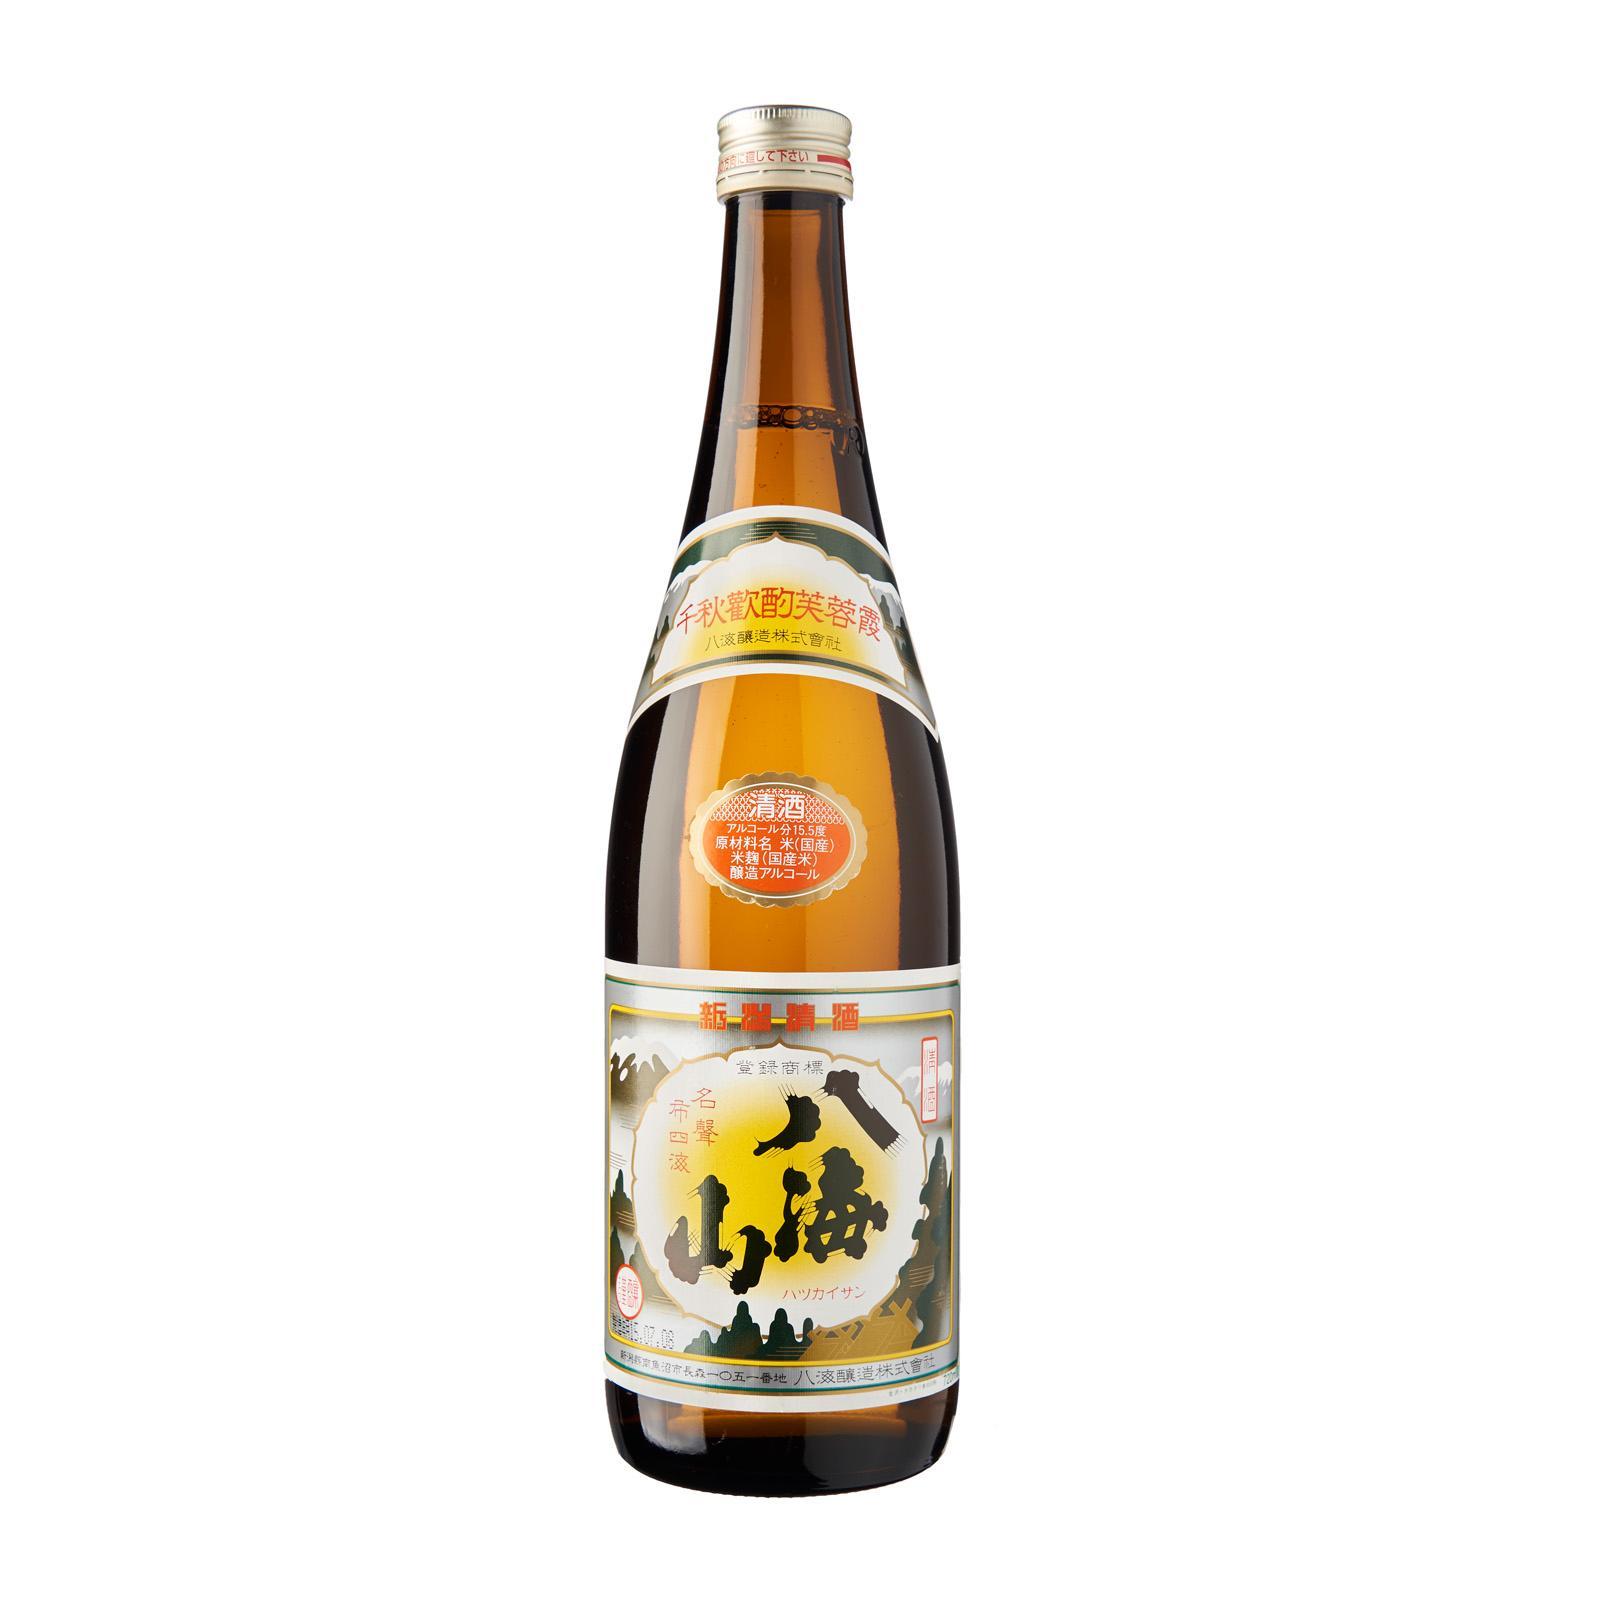 Hakkaisan Futsuyu 15.5% 720ml